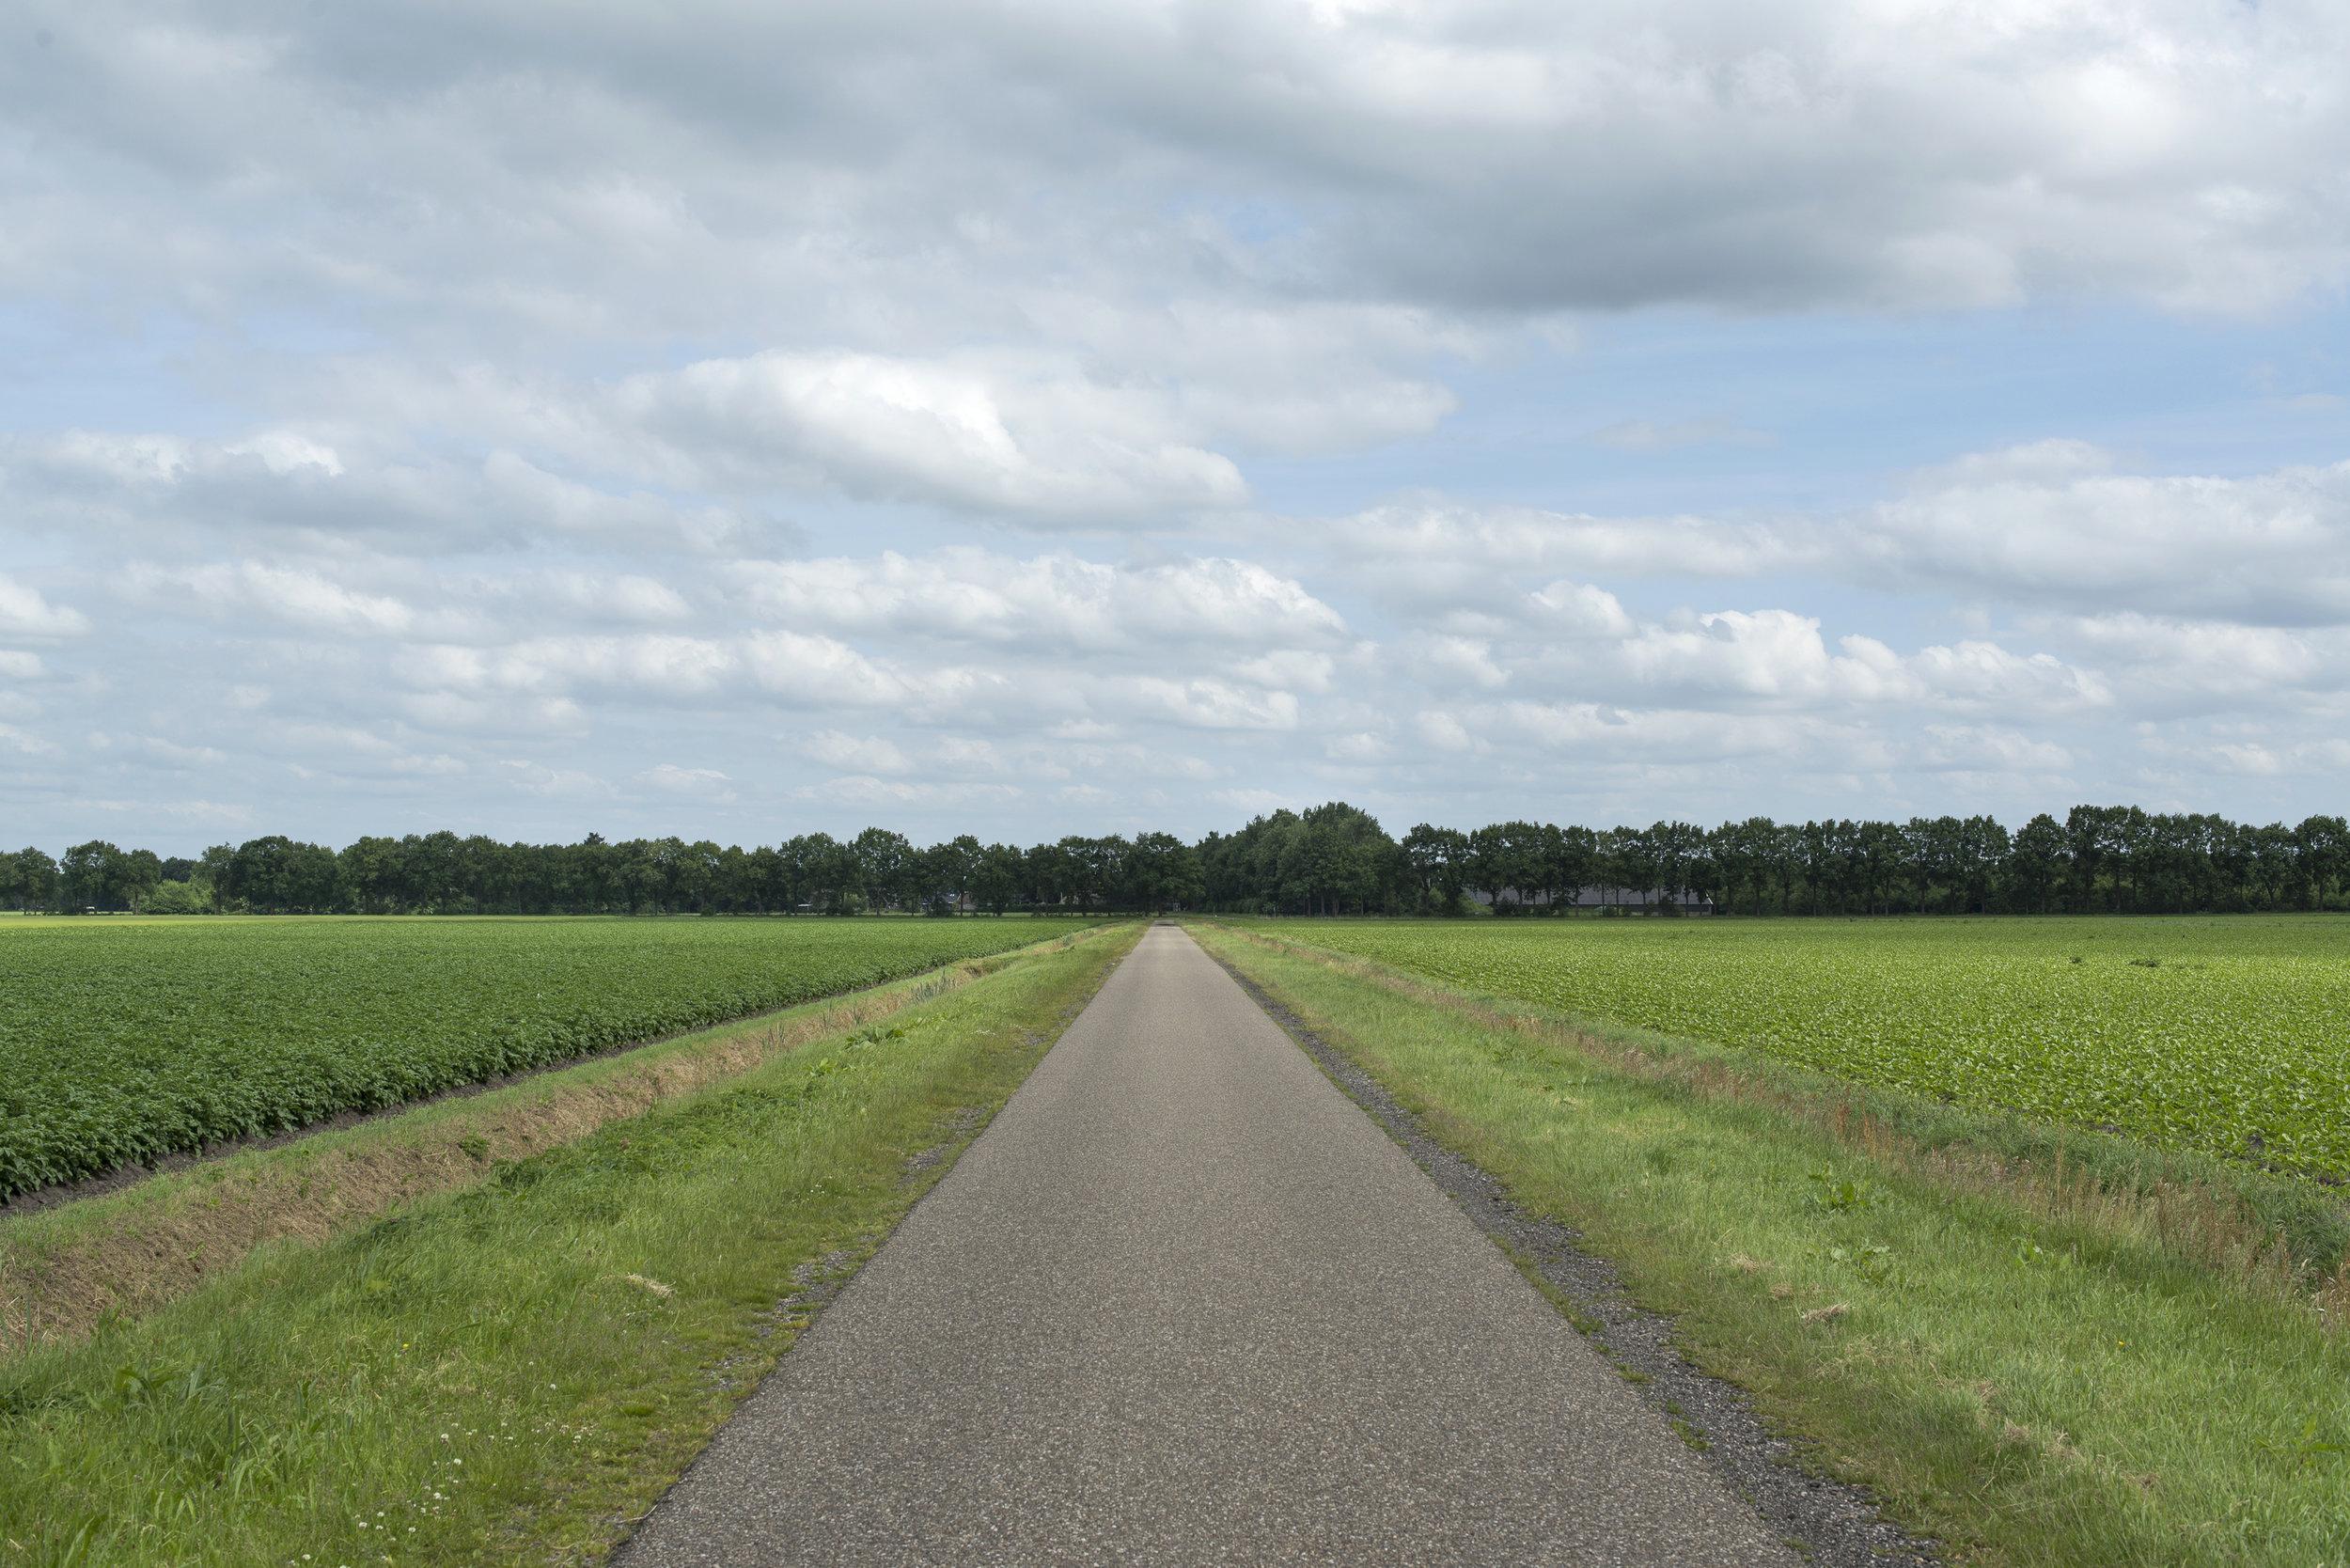 ©-Yorit-Kluitman-Gemeente-Coevorden.jpg